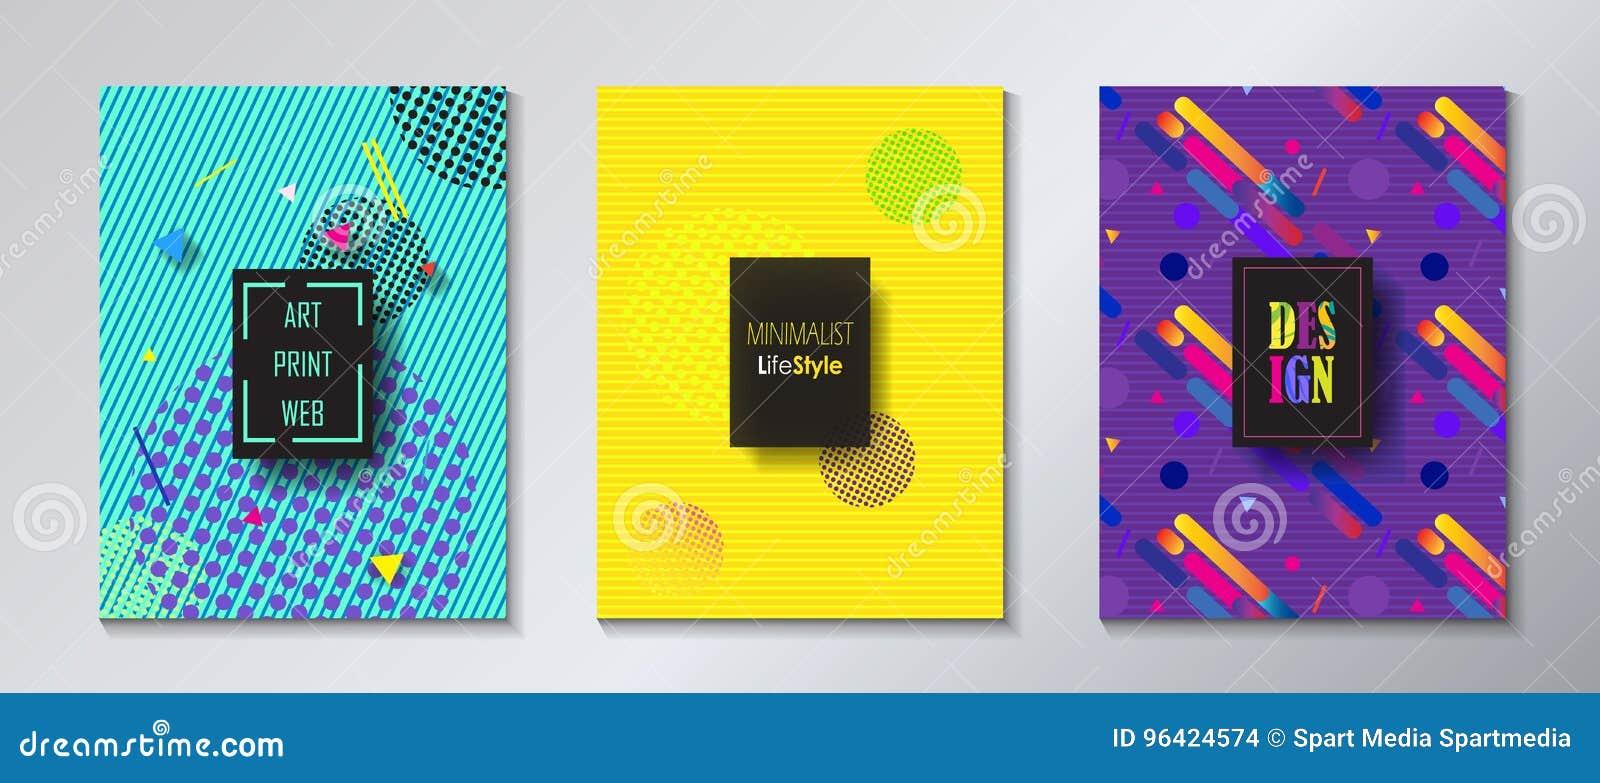 pop art print web minimalist brochure set stock vector